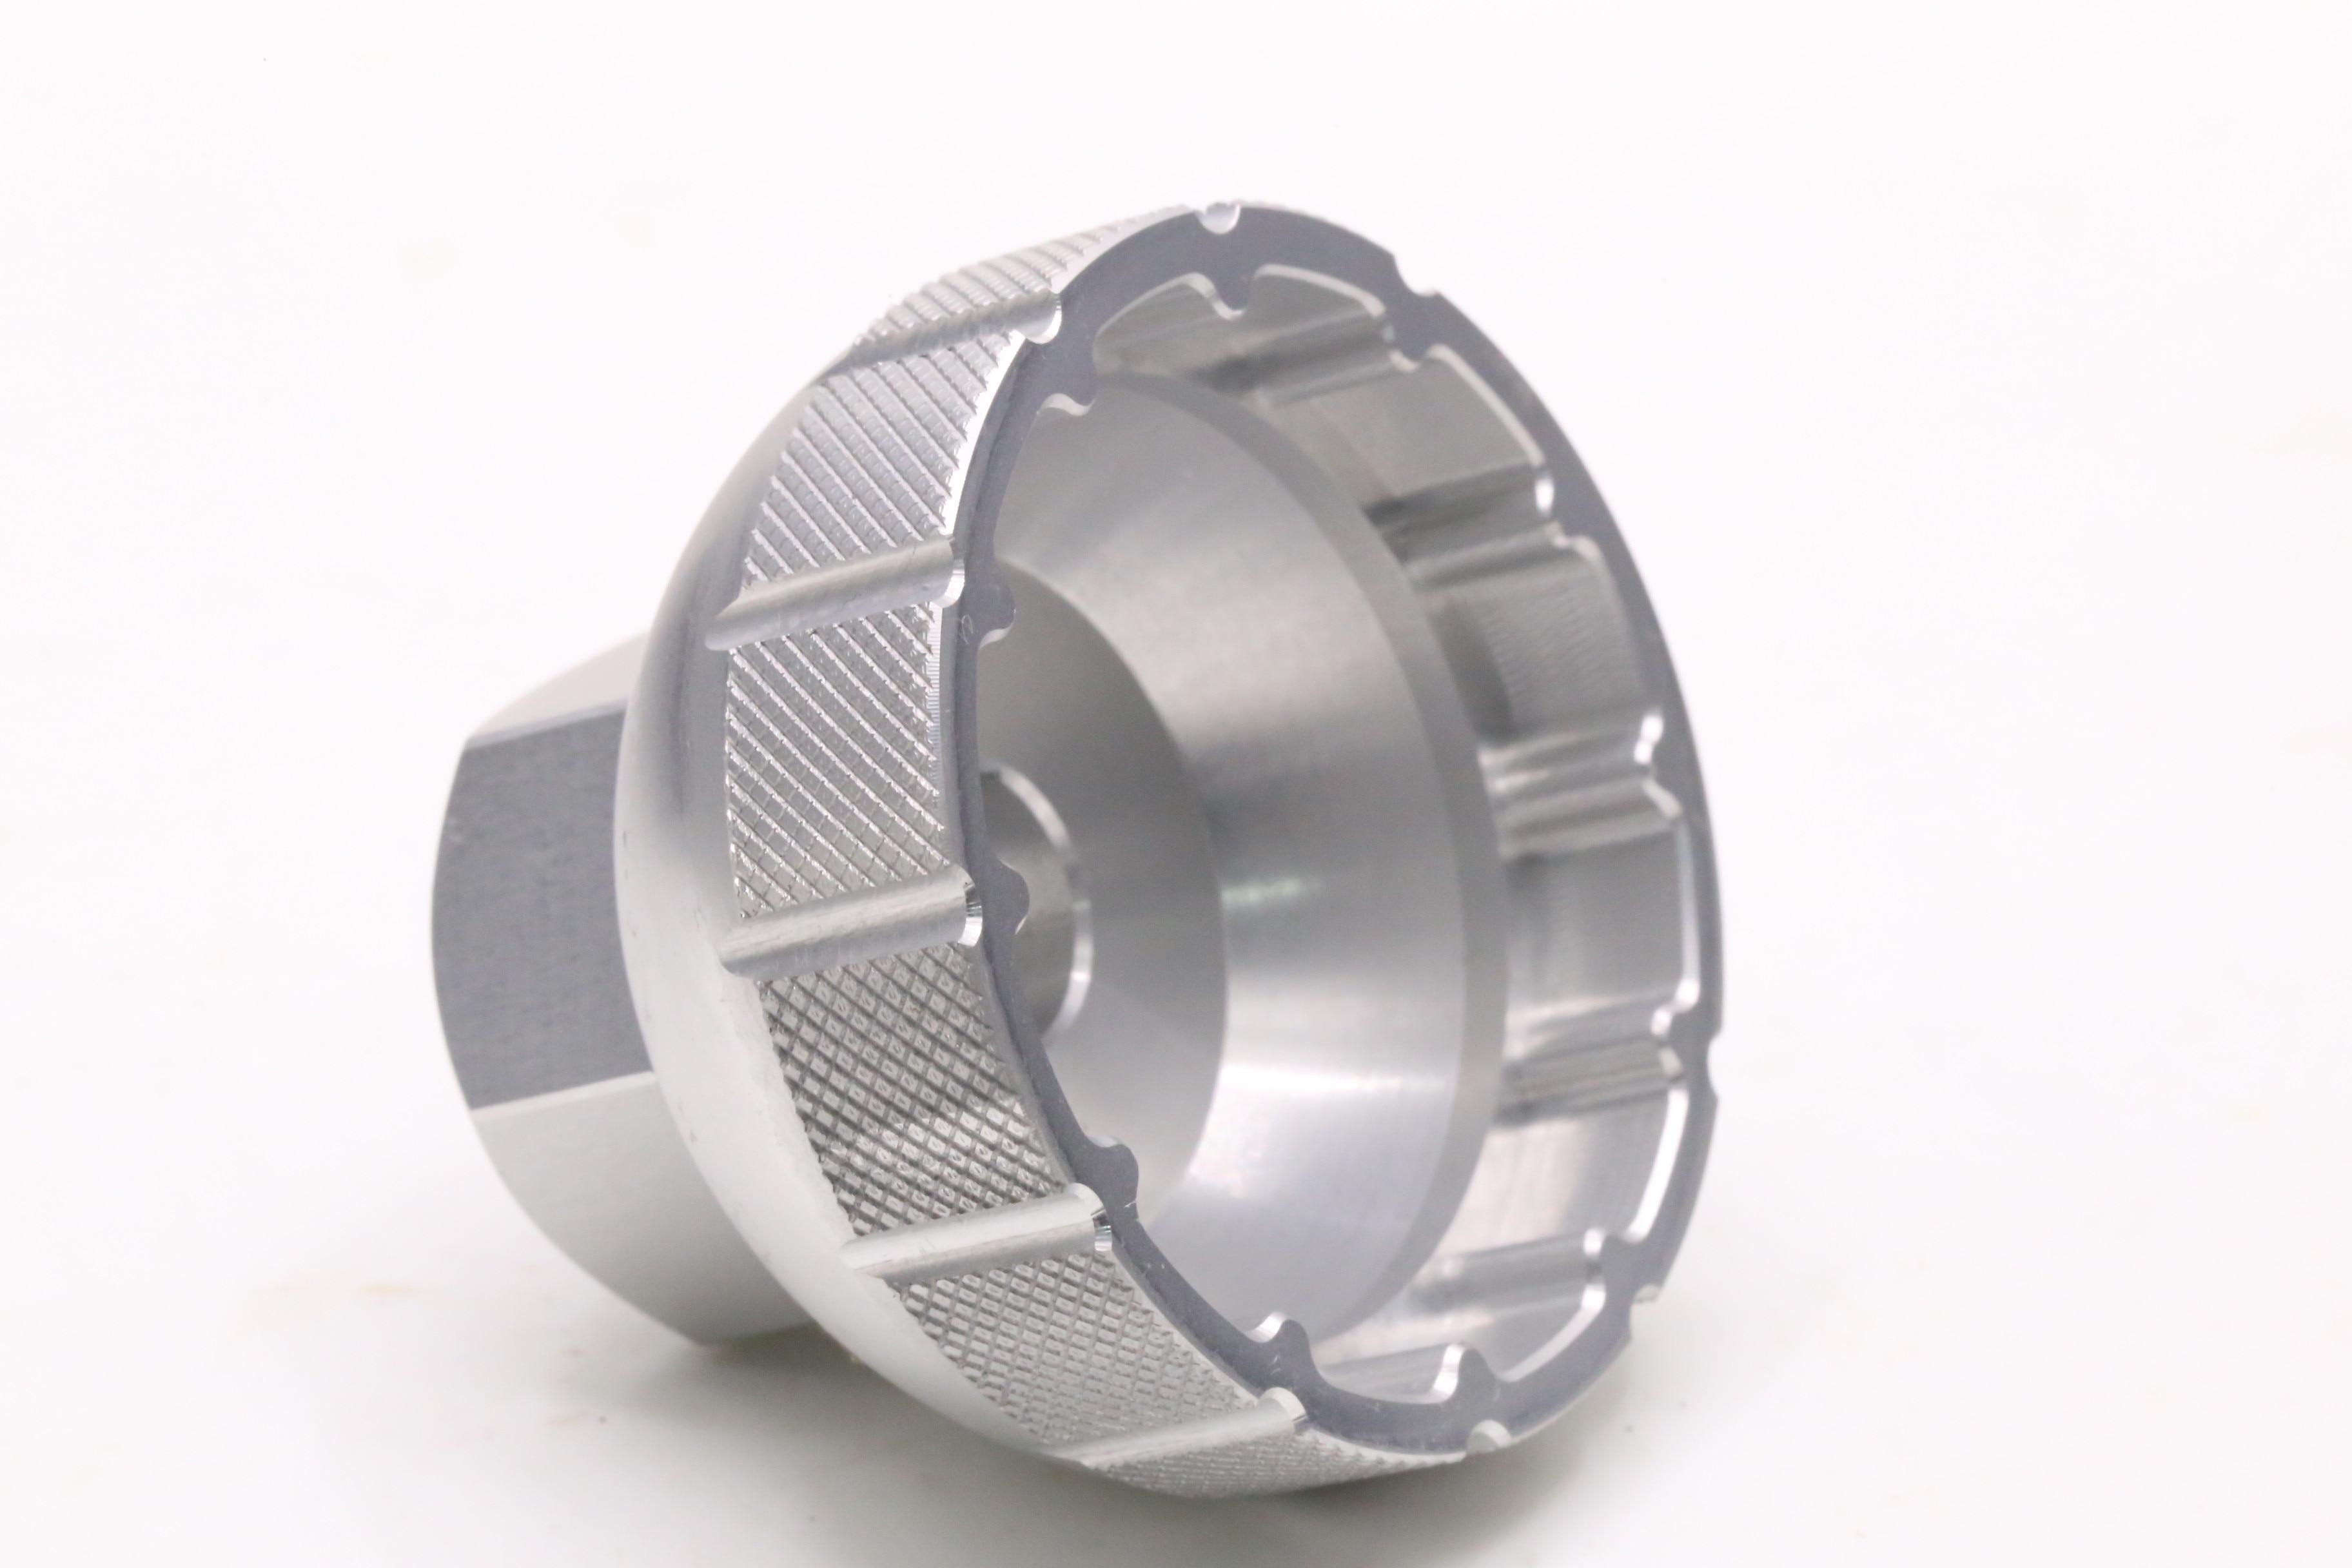 AL7075 90g DUB-BSA Crankset Wrench for SRAM ZRACE SRAM DUB Bottom Brackets Tool